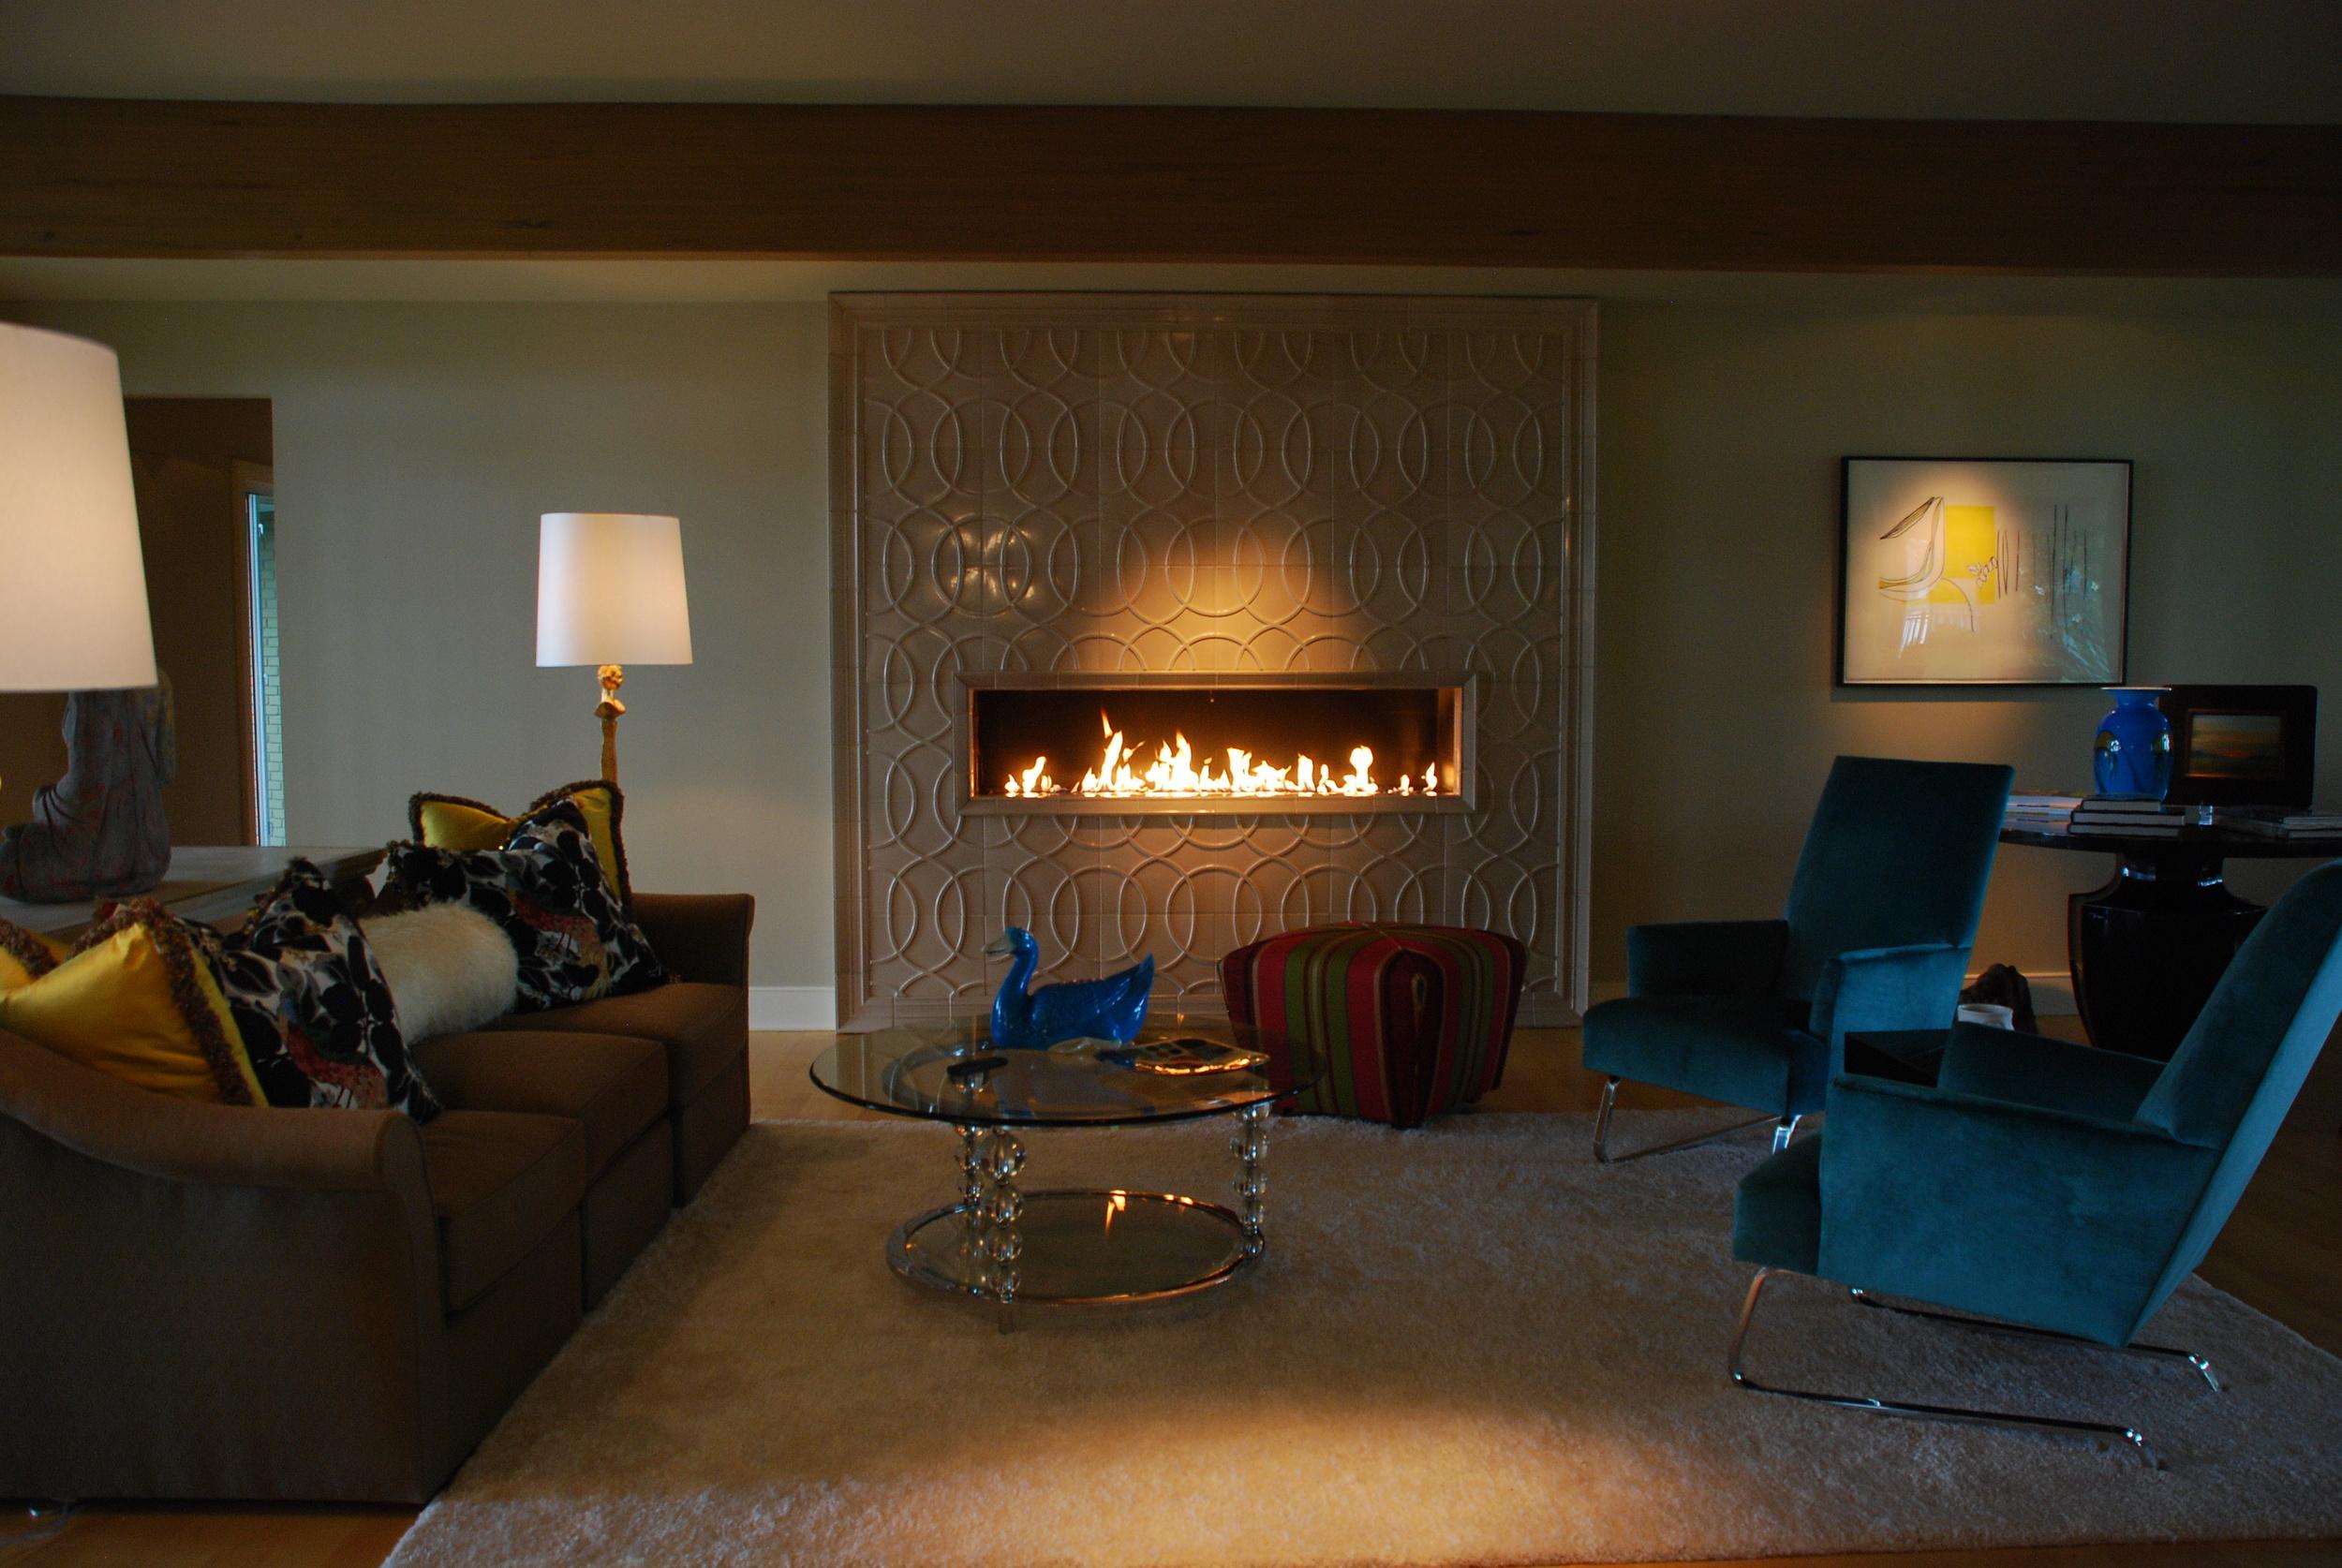 Ryan Living Room 3.JPG